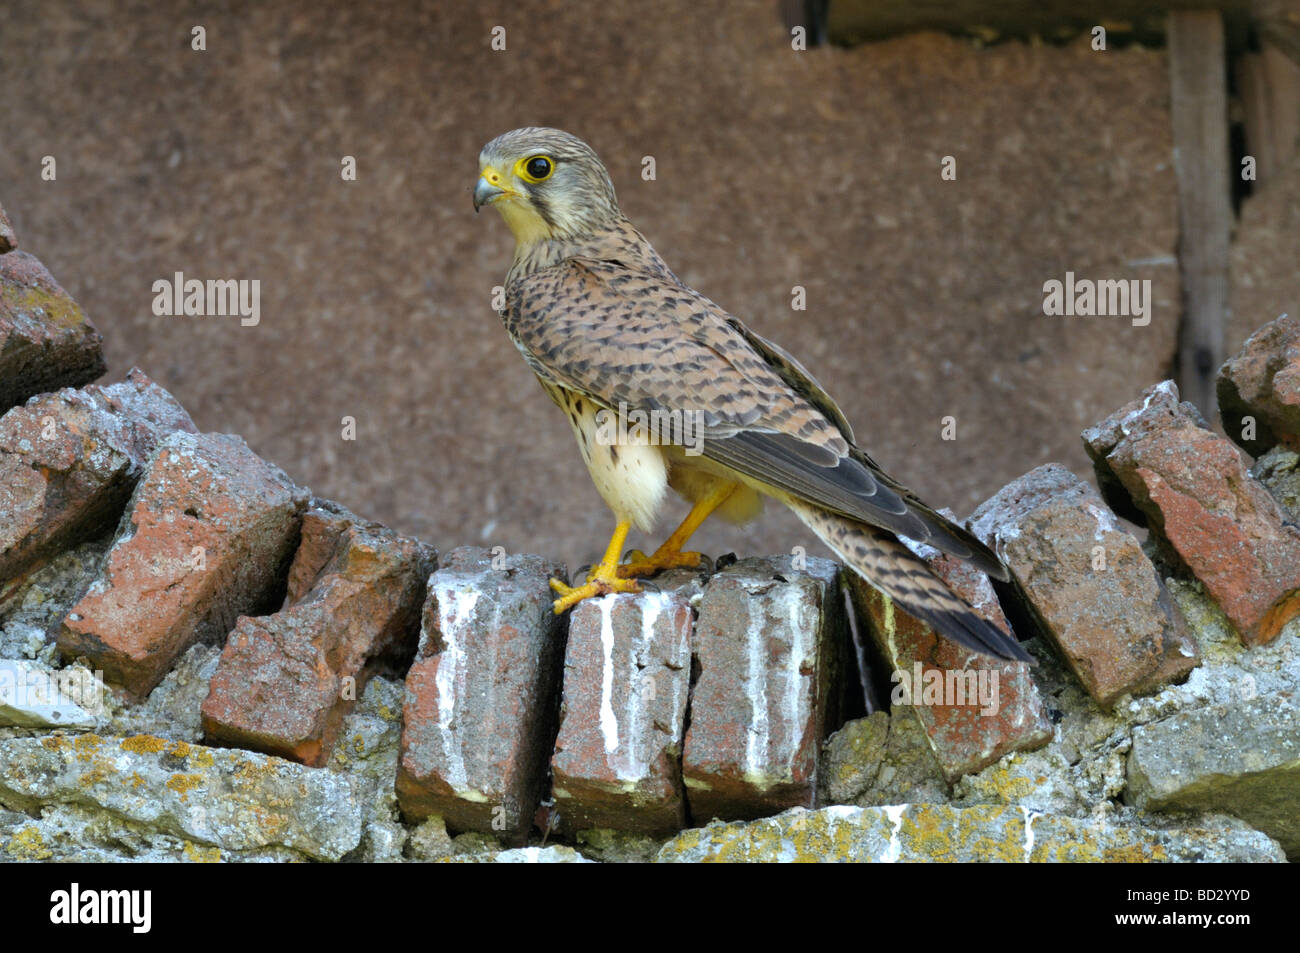 Common Kestrel (Falco tinnunculus). Adult close to nest - Stock Image